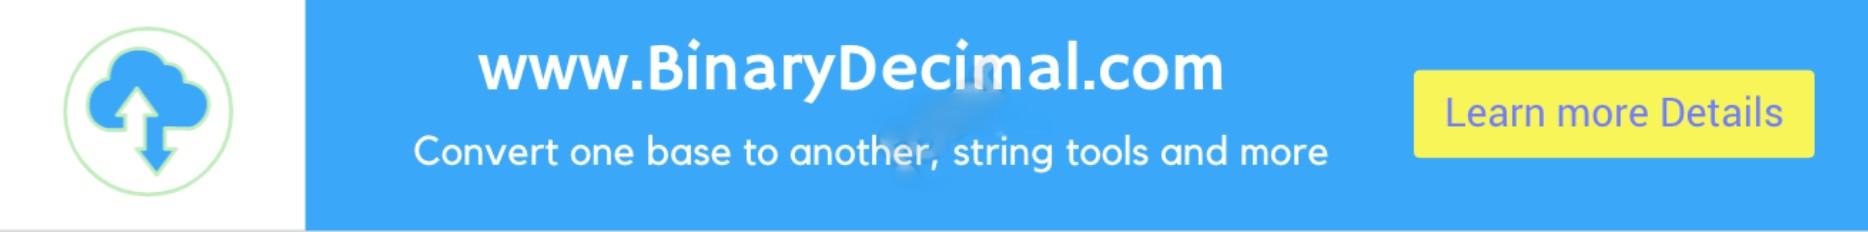 BinaryDecimal.com